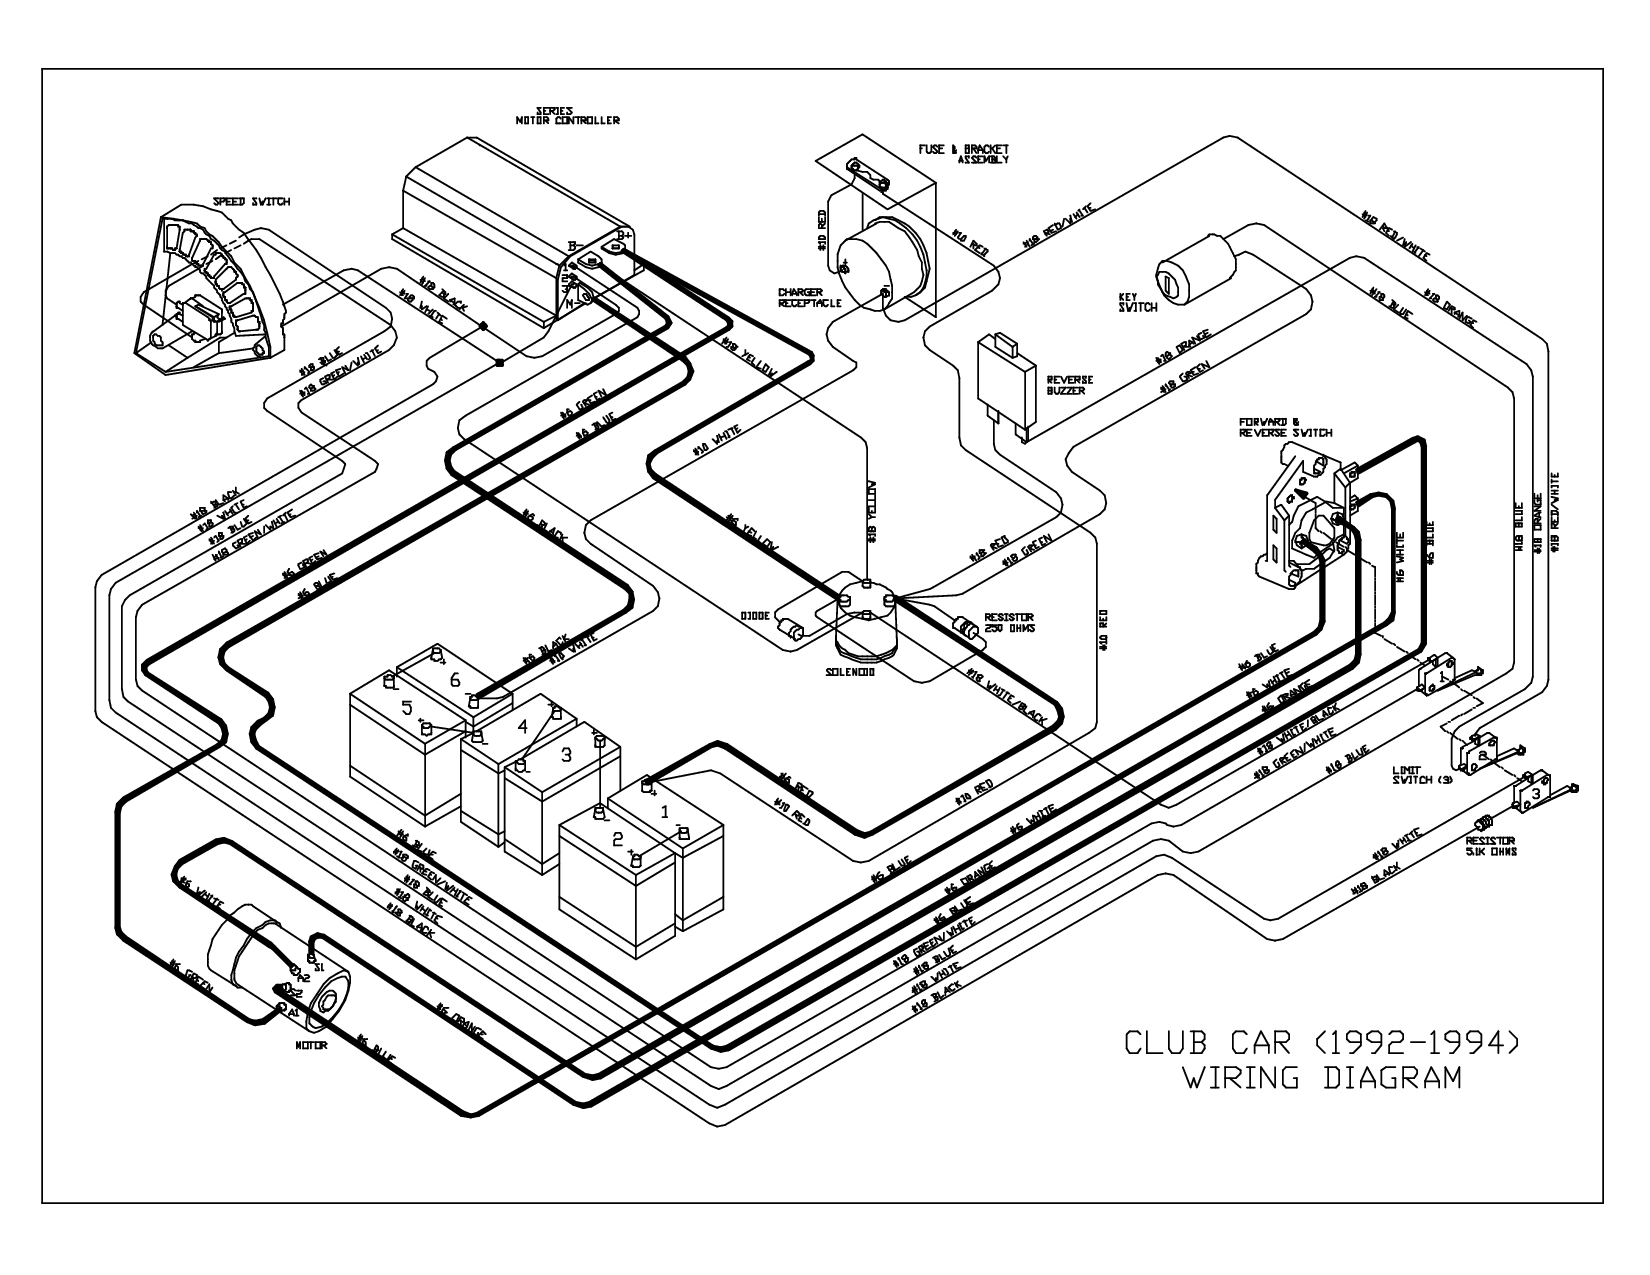 1992 Club Car Wiring Diagram Typical Refinery Process 1995 1994